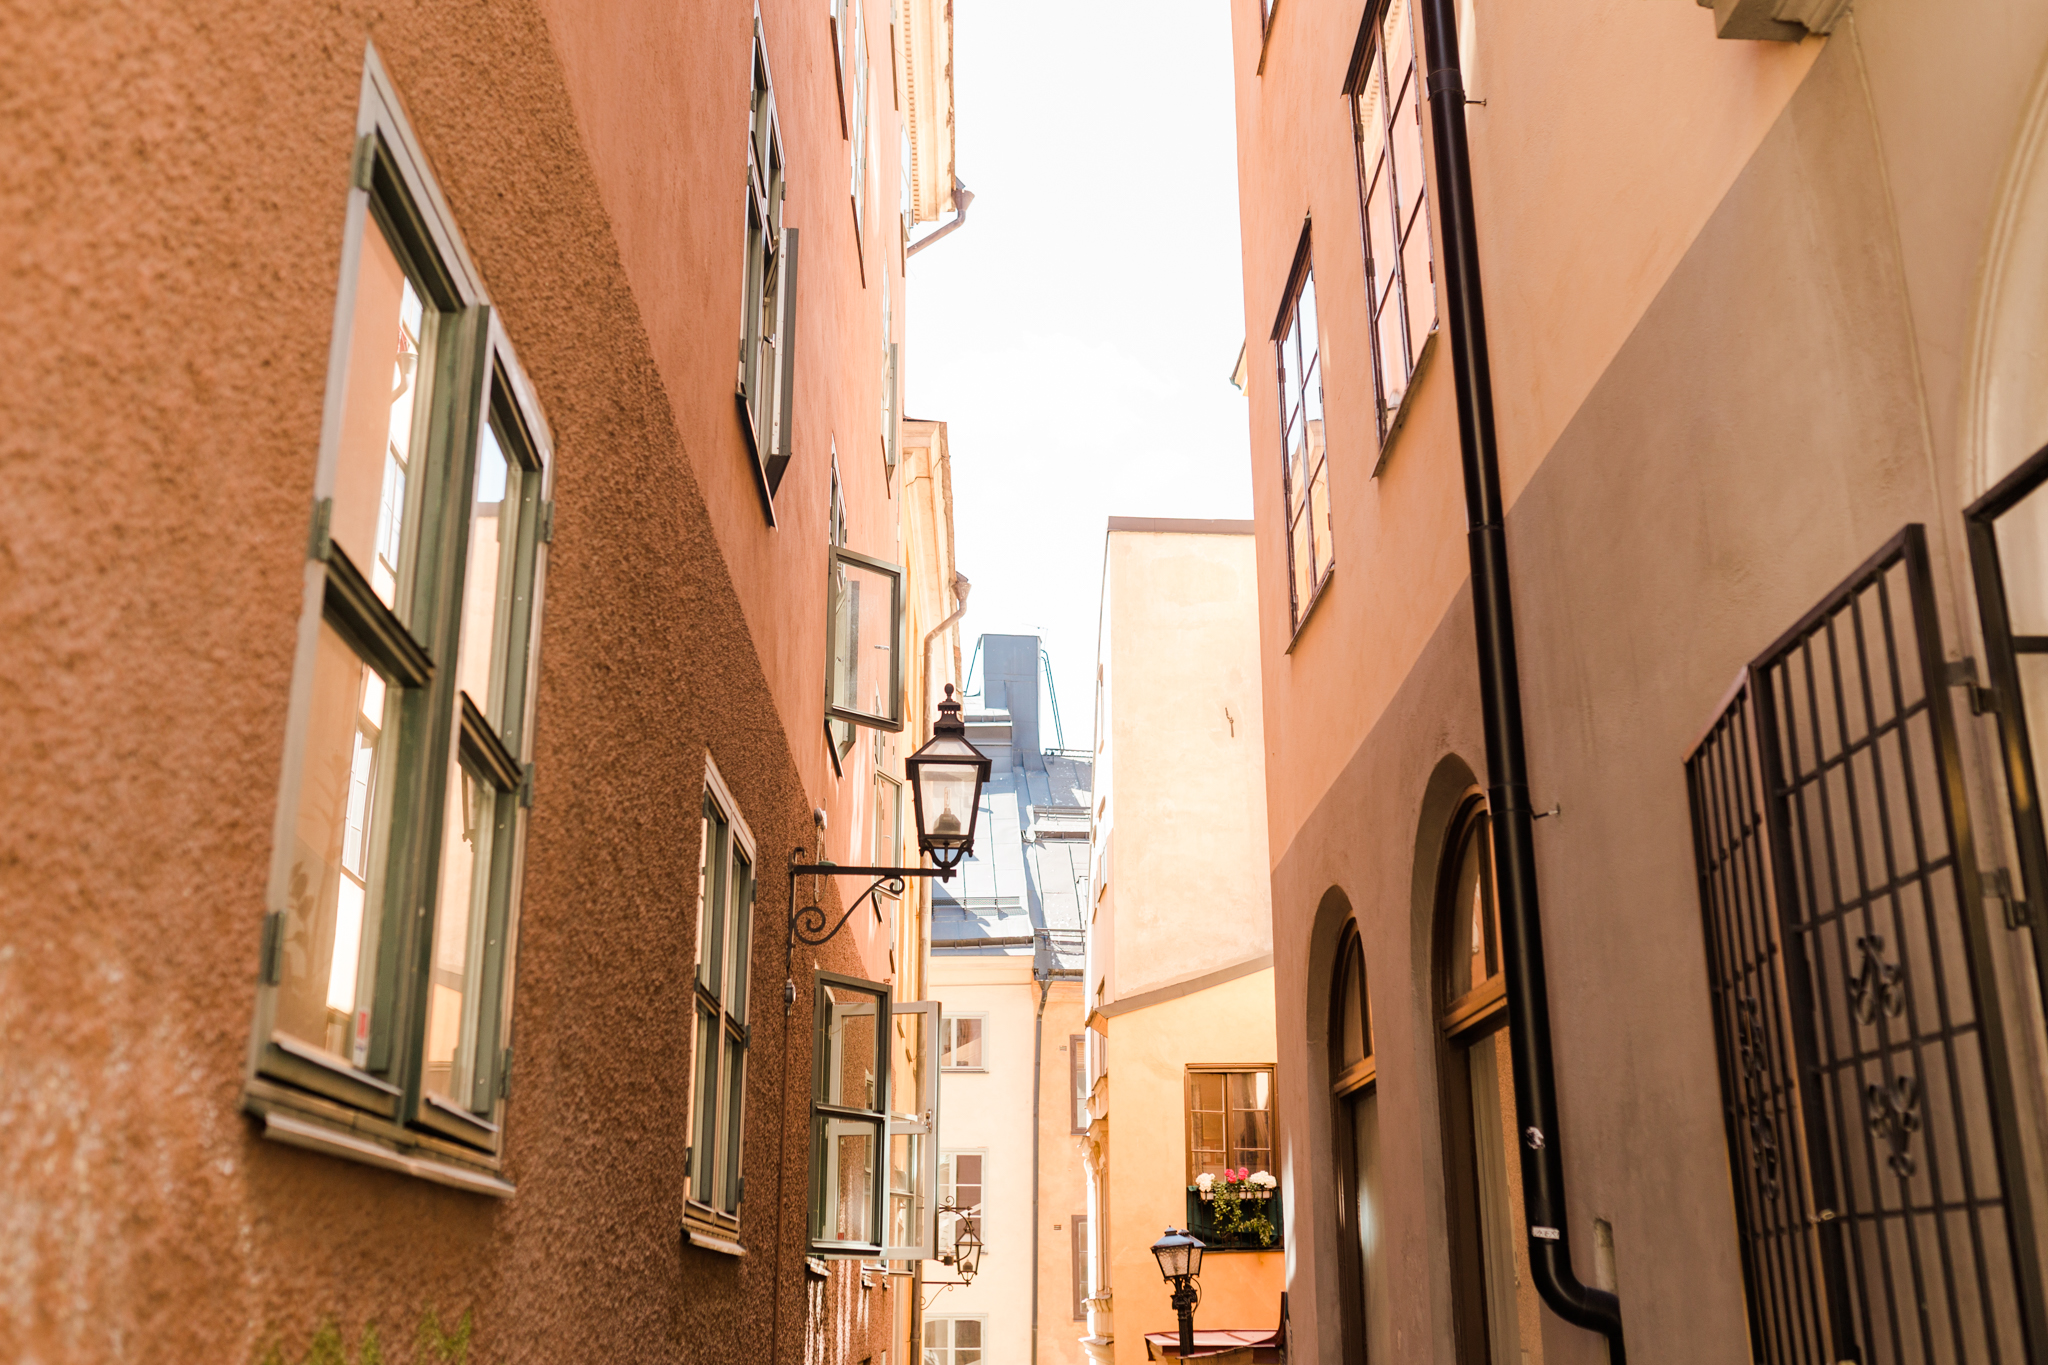 stockholm-005.jpg